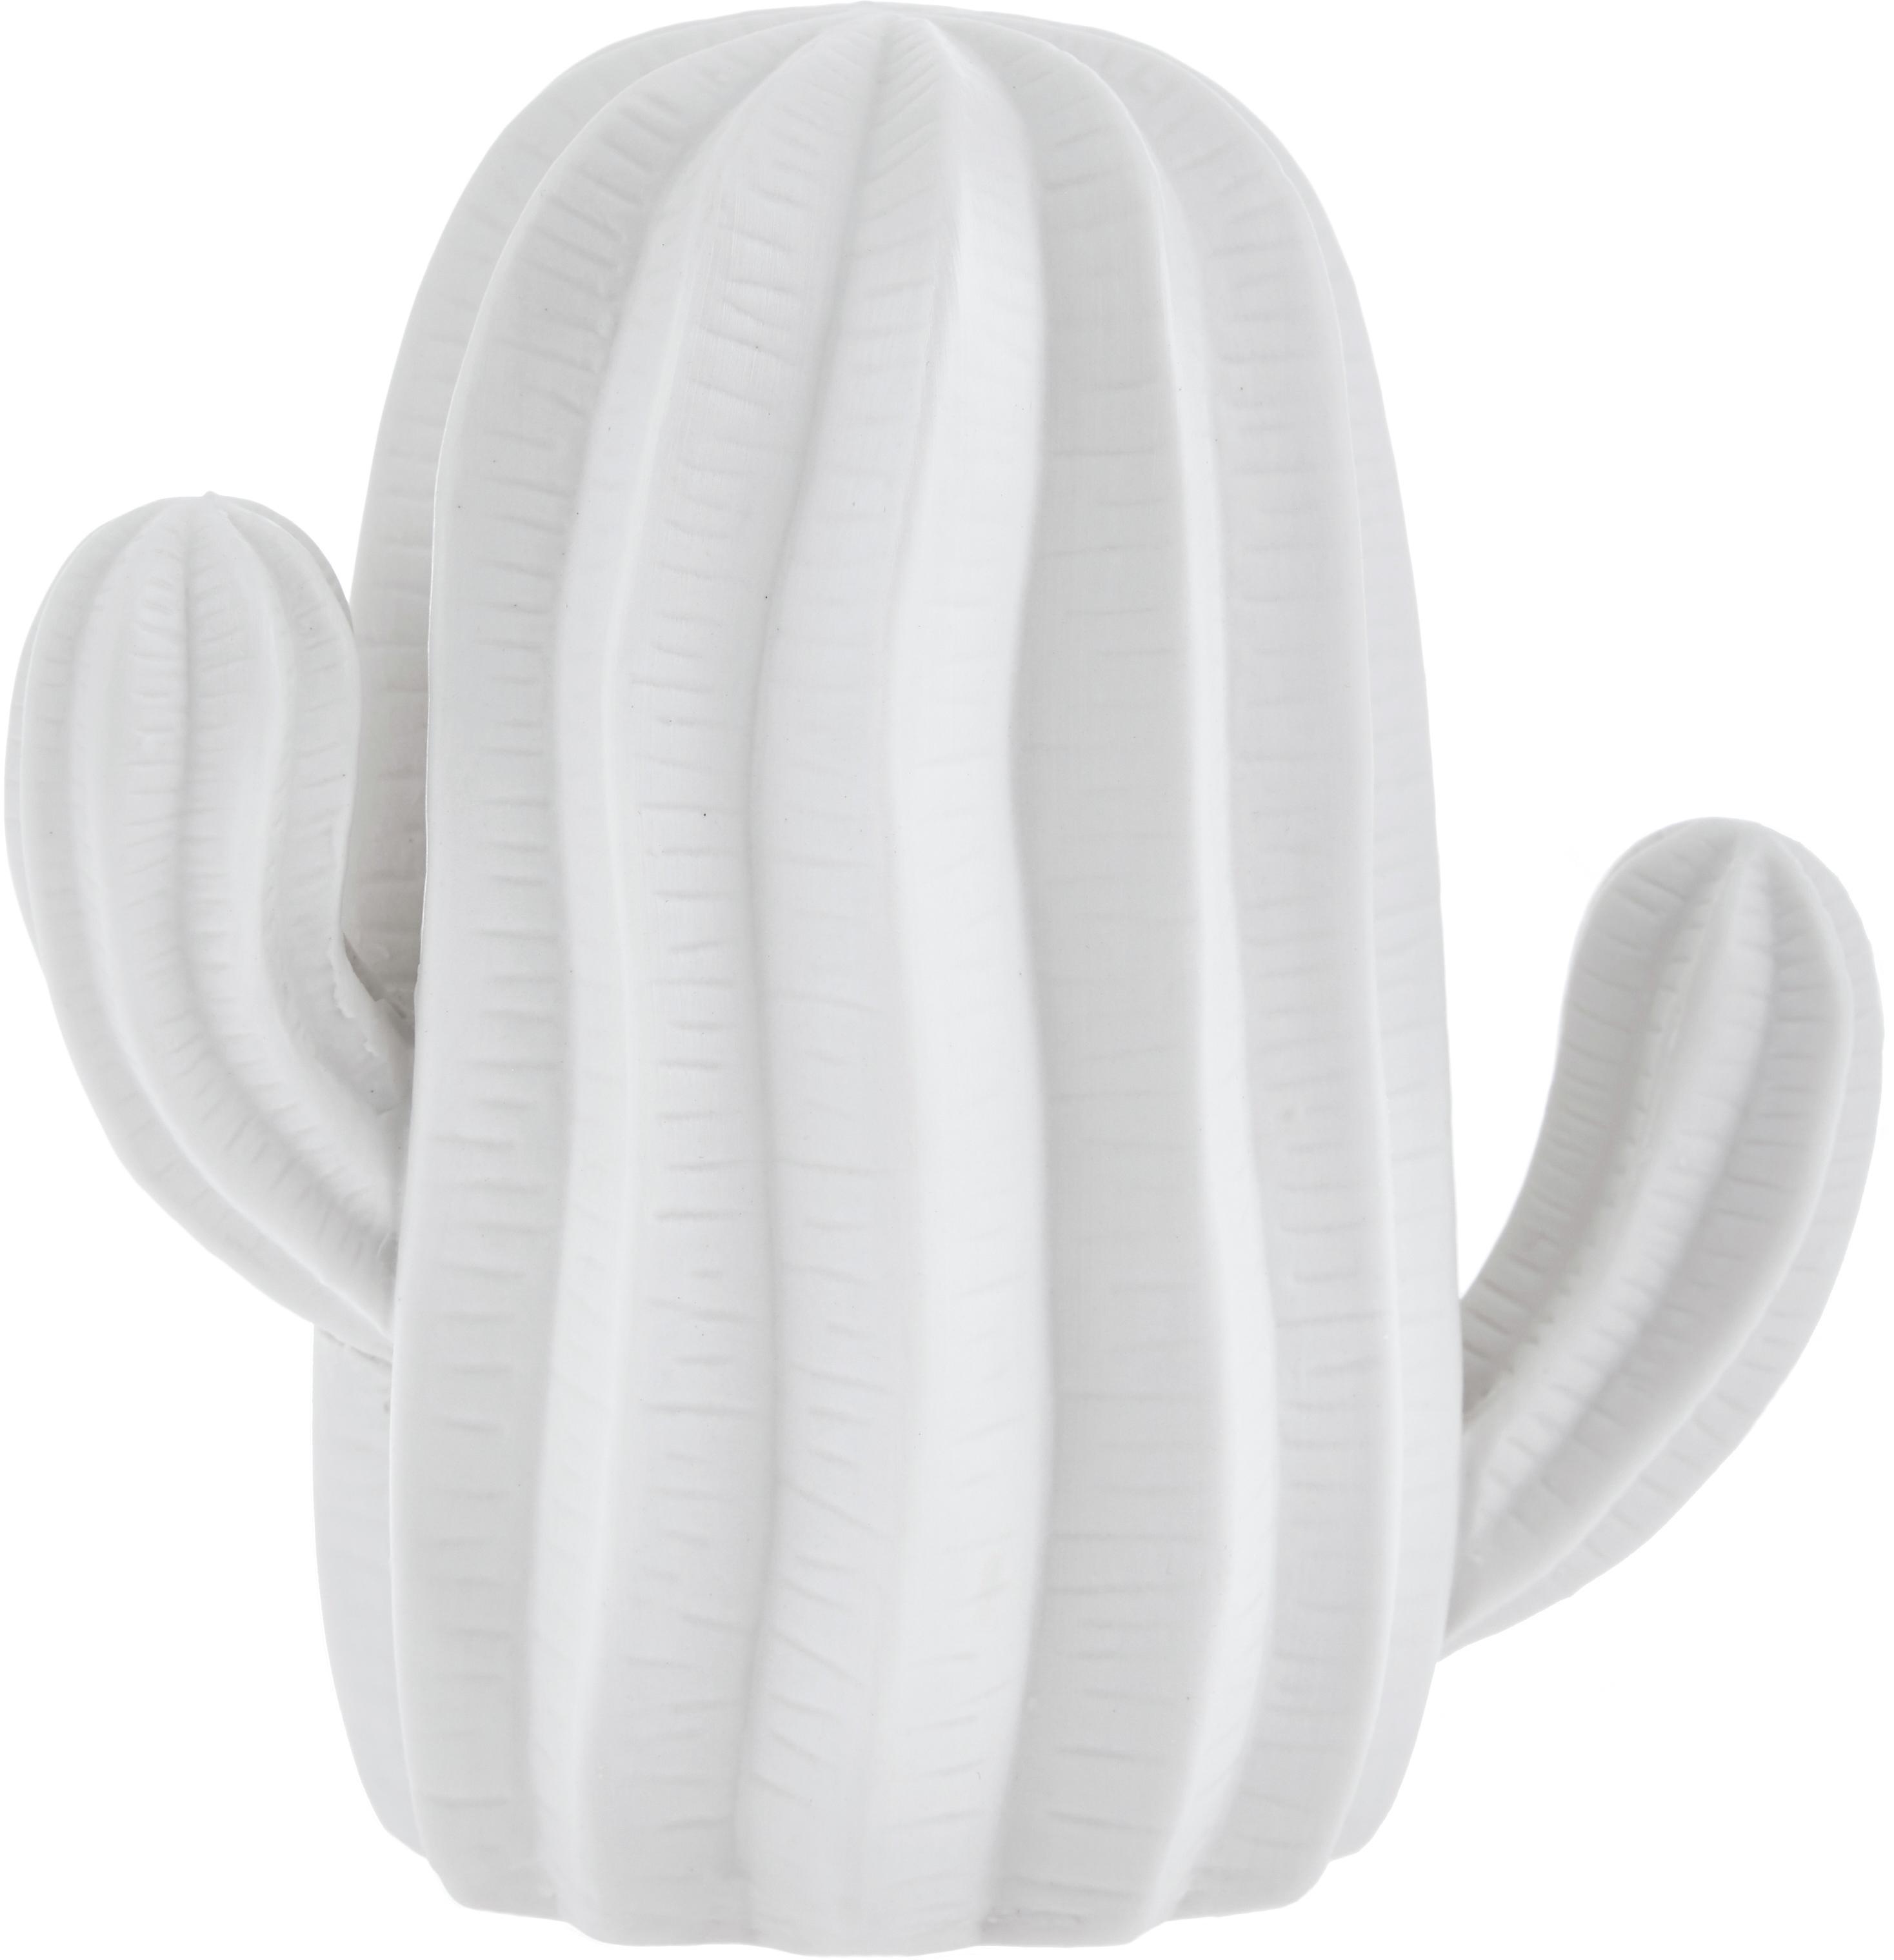 Deko-Kakteen-Set Dina, 3-tlg., Porzellan, unbehandelt, matt, Weiß, Sondergrößen